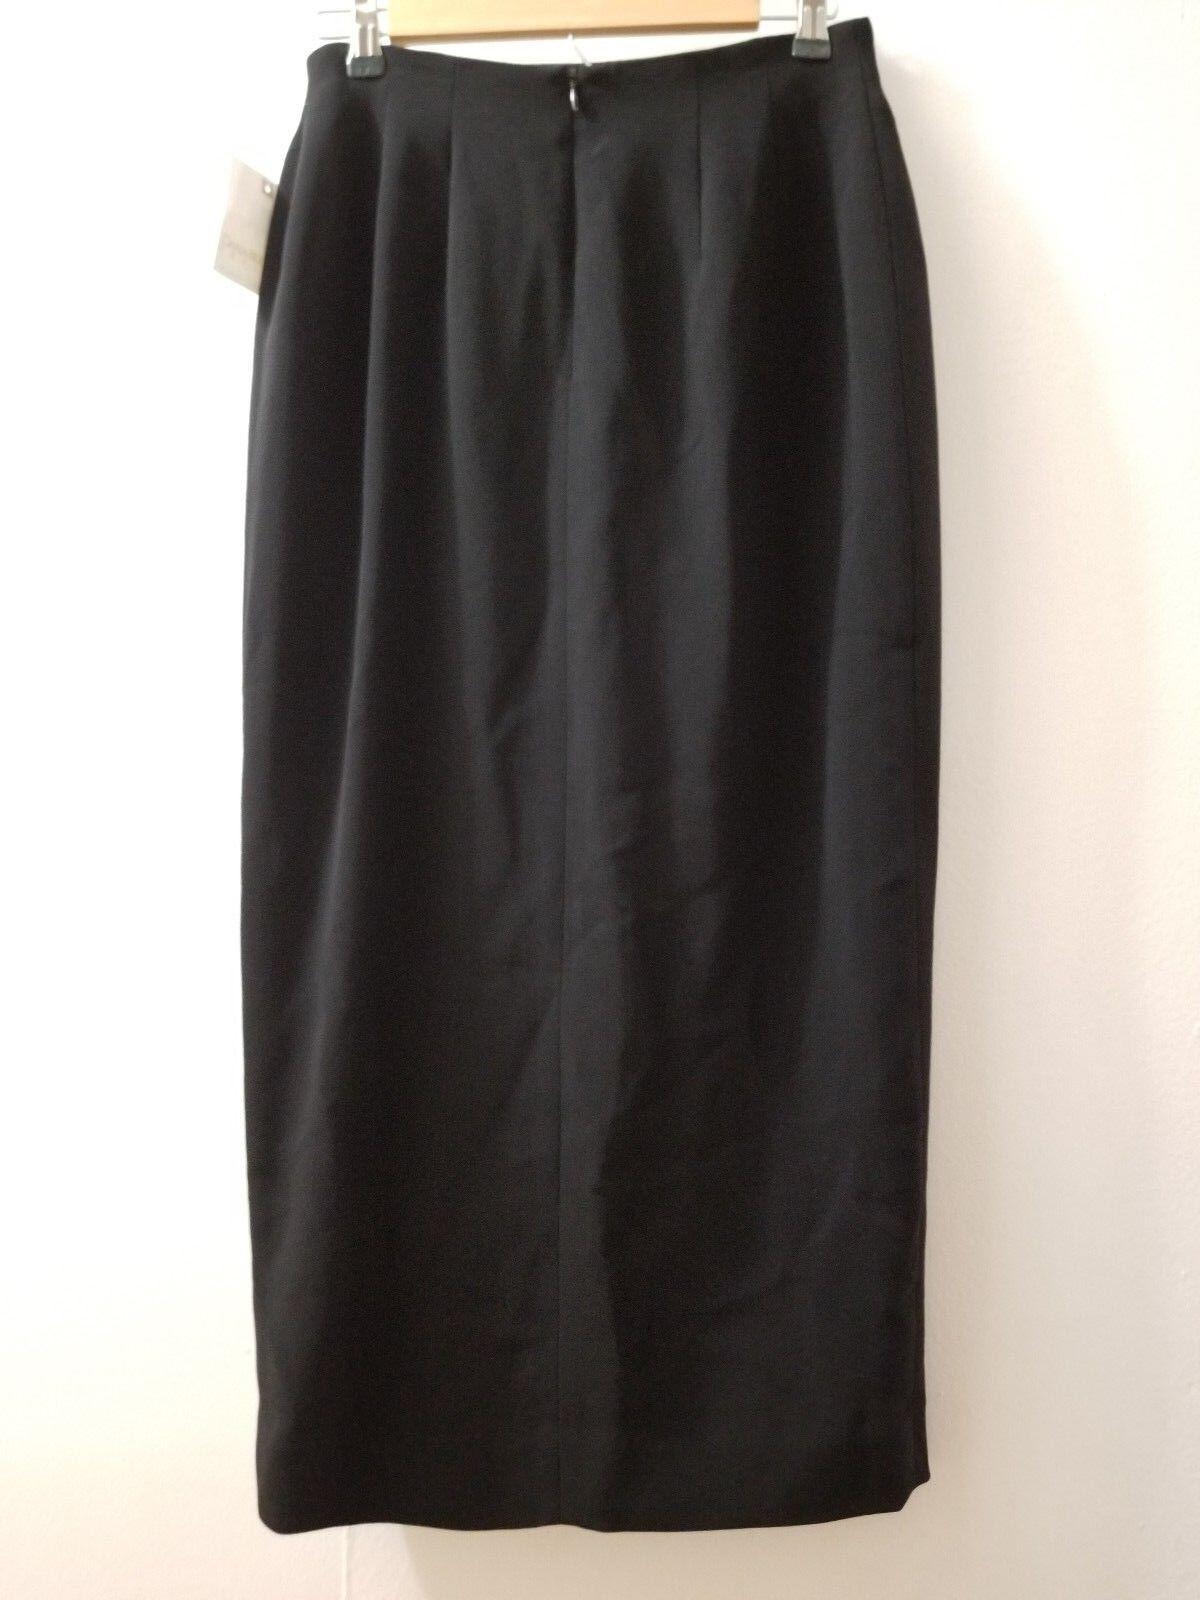 e9c33b0c5 Dana Buchman Long Black Origami Skirt Front Slit Size 10 Petite Fits ...